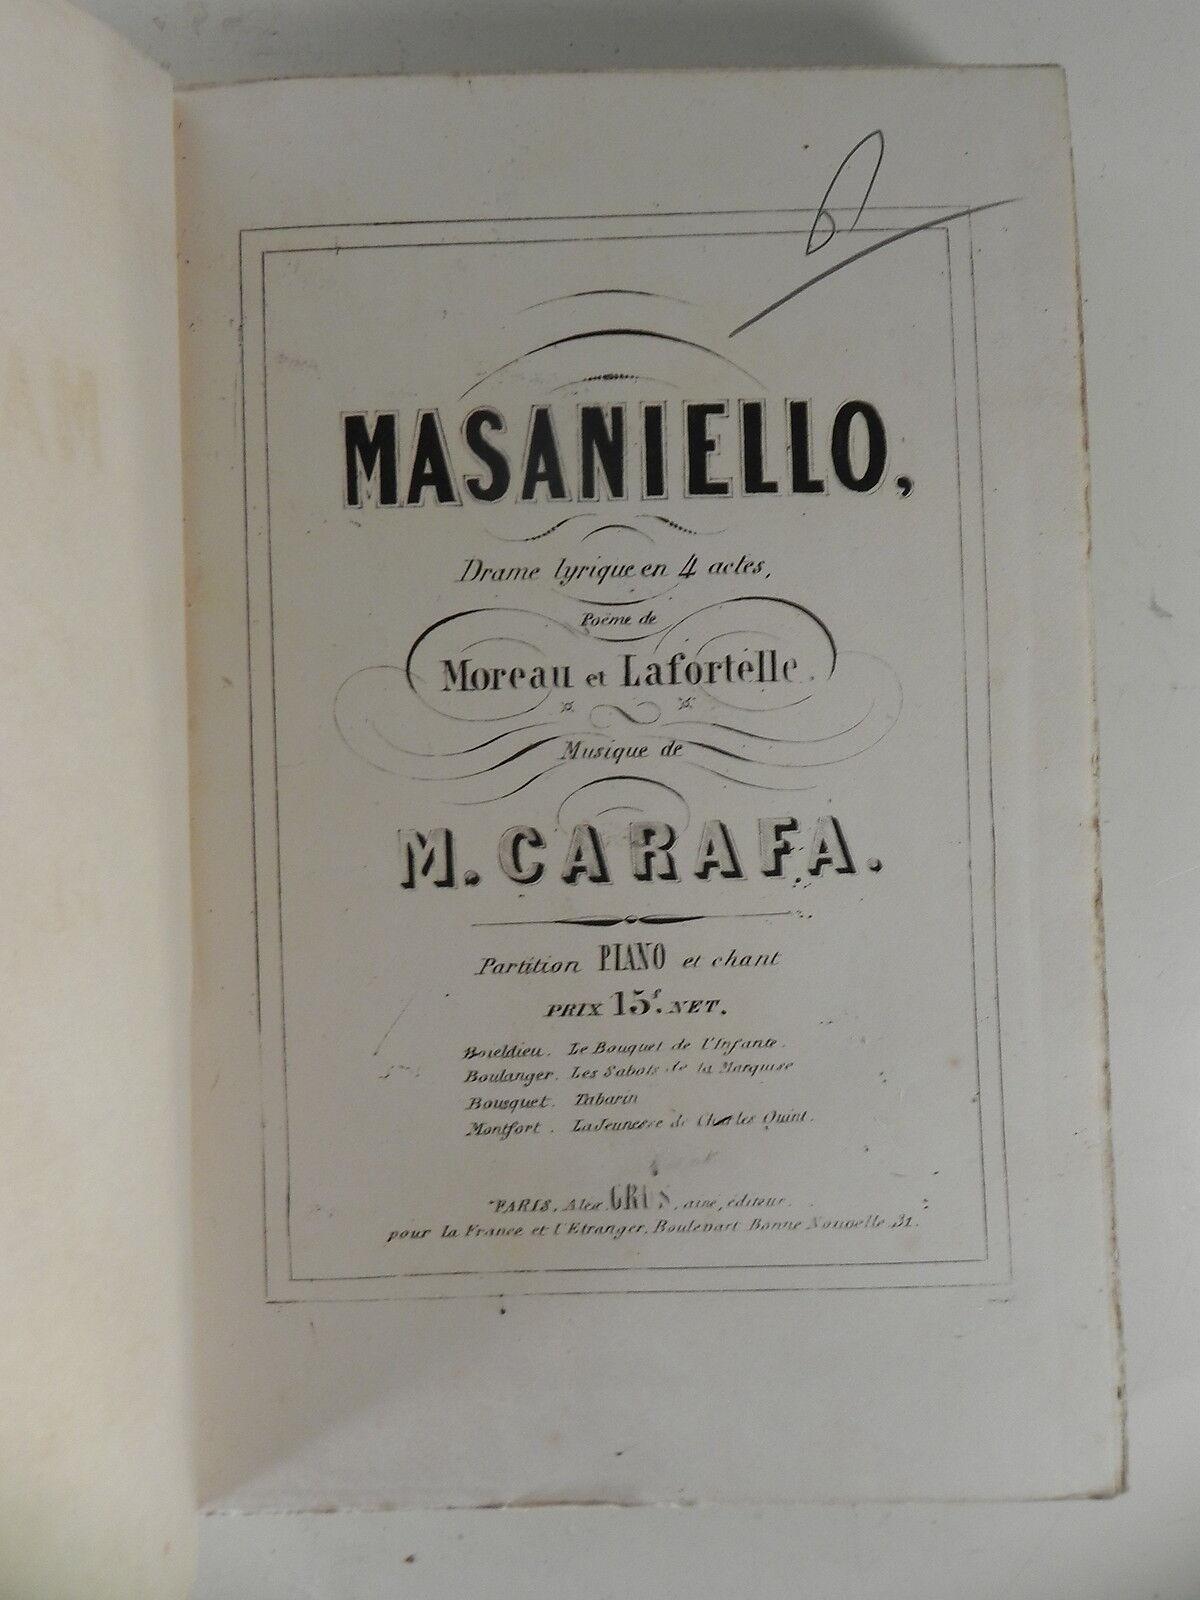 CARAFA M. MASANIELLO Drame Lyrique Grus 1845 Partition sheet music score